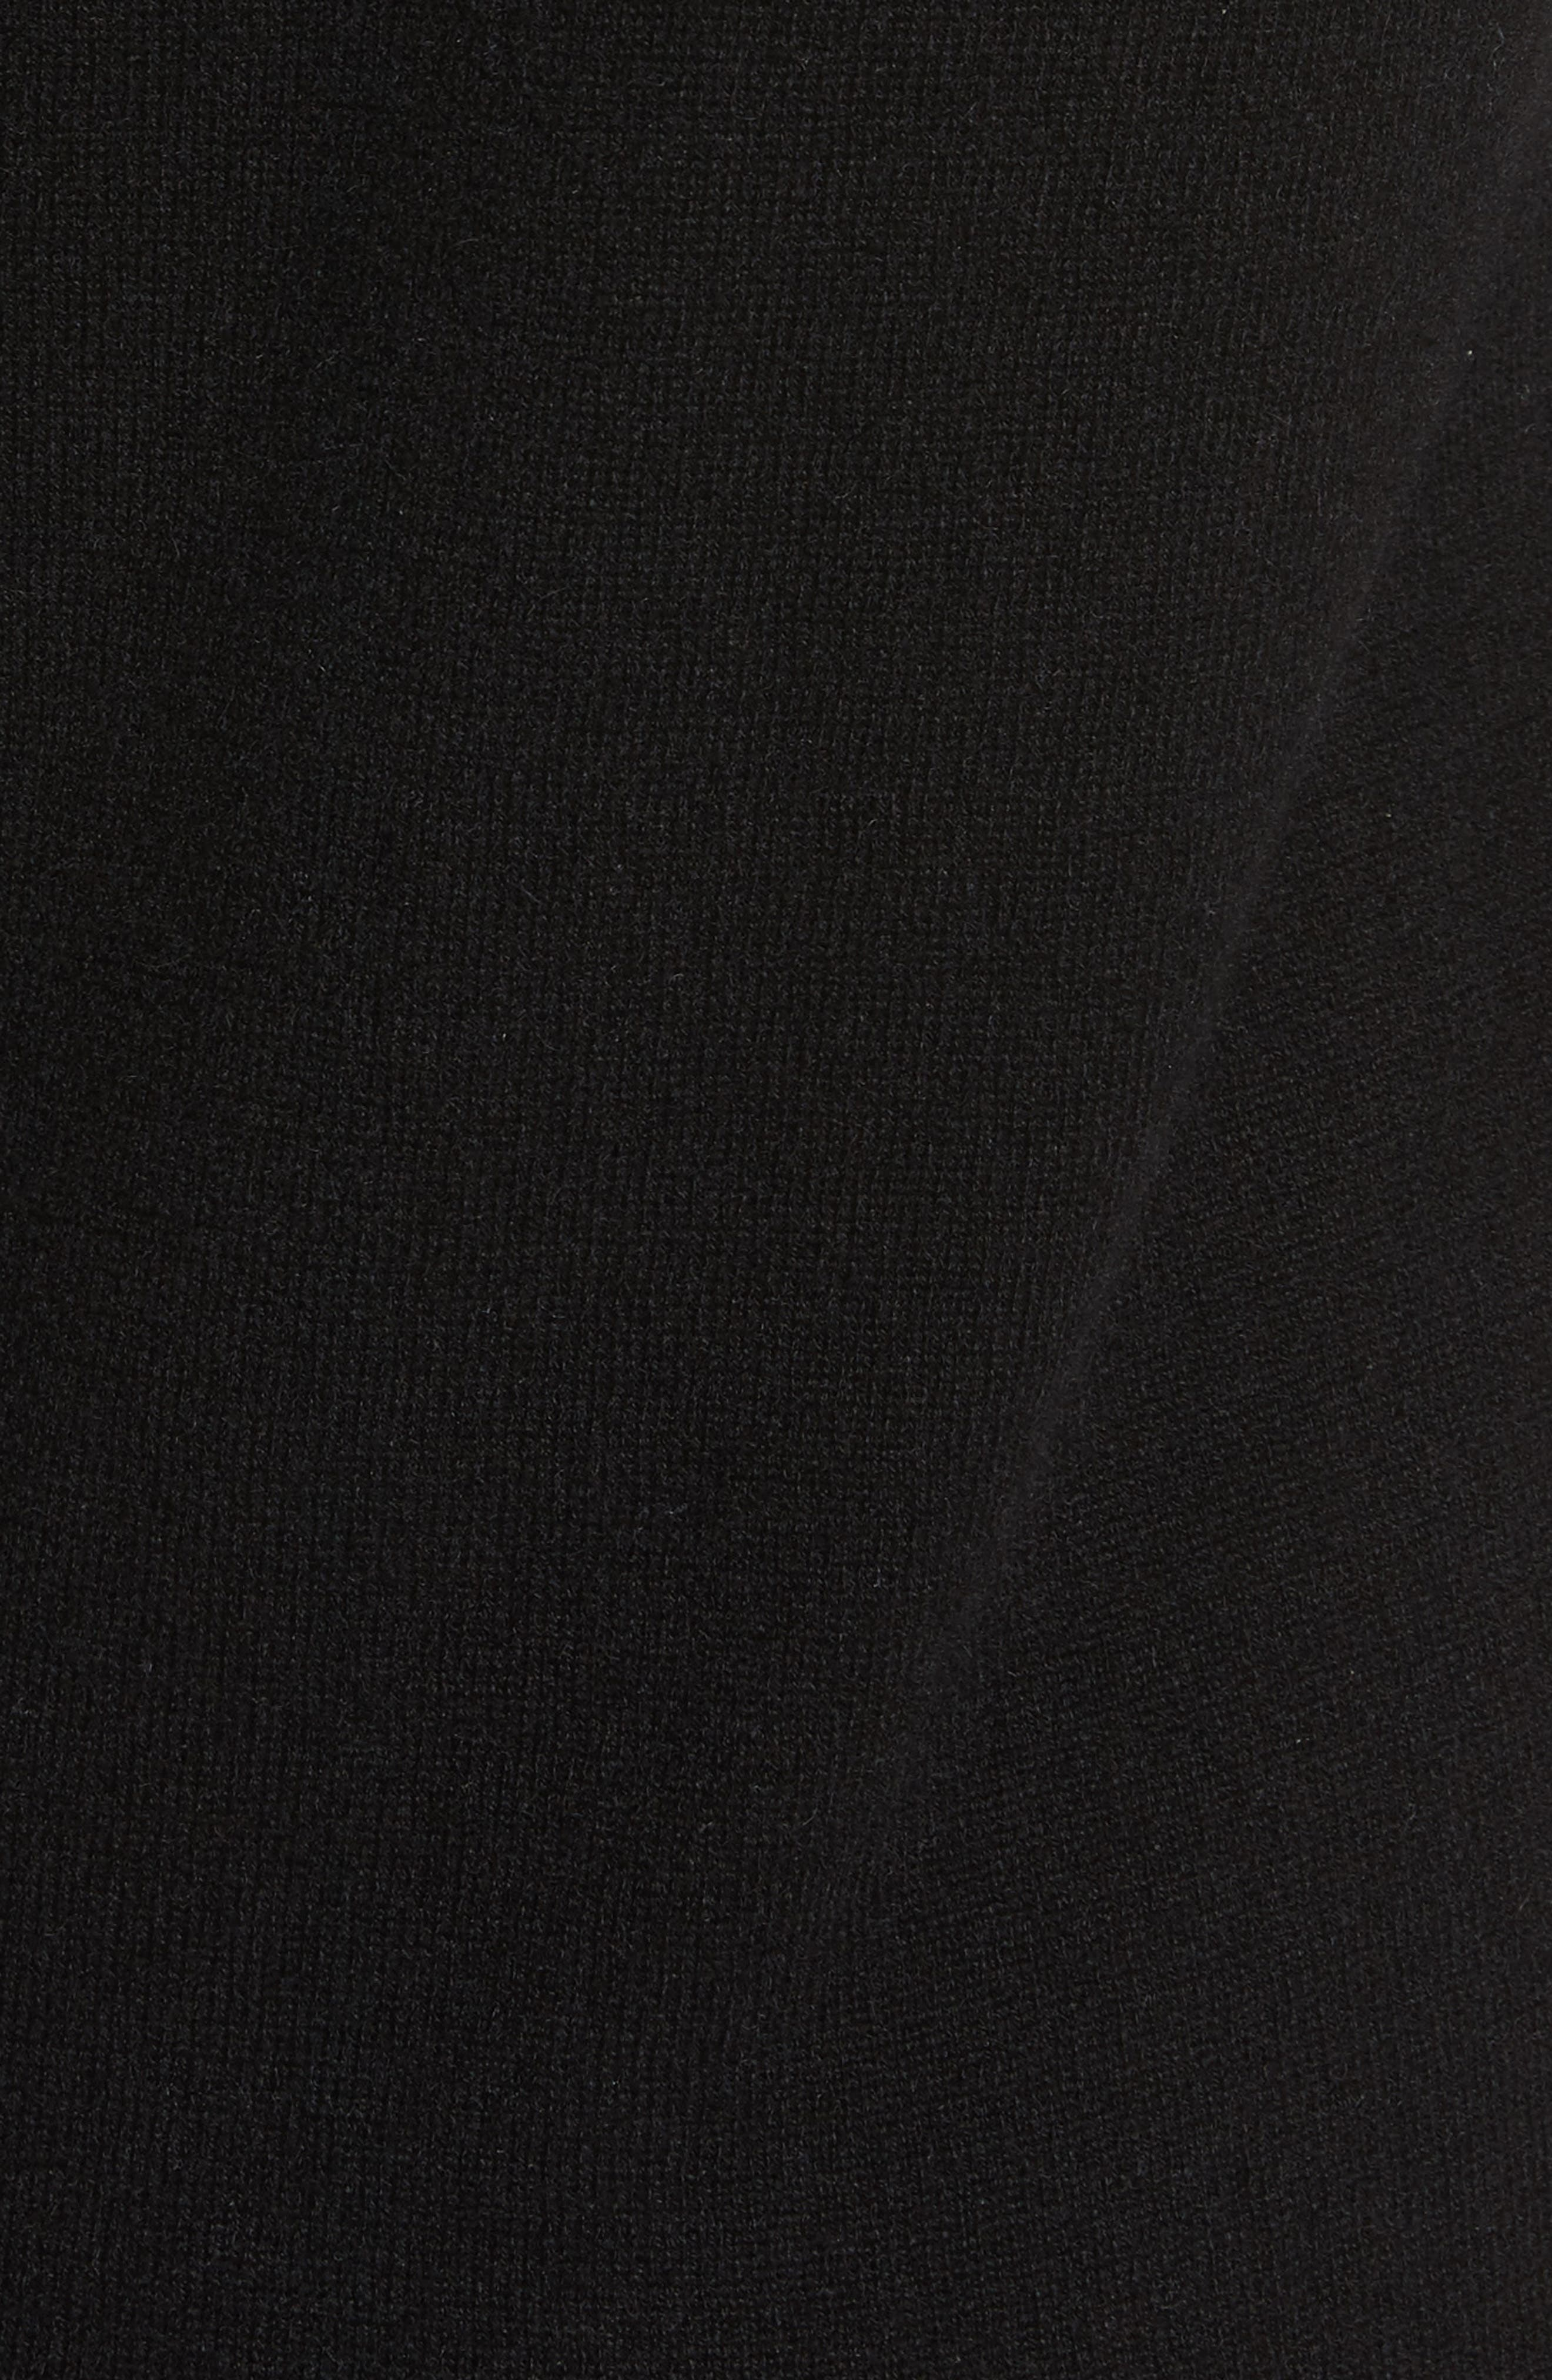 Snyder Cashmere Knit Midi Dress,                             Alternate thumbnail 5, color,                             001